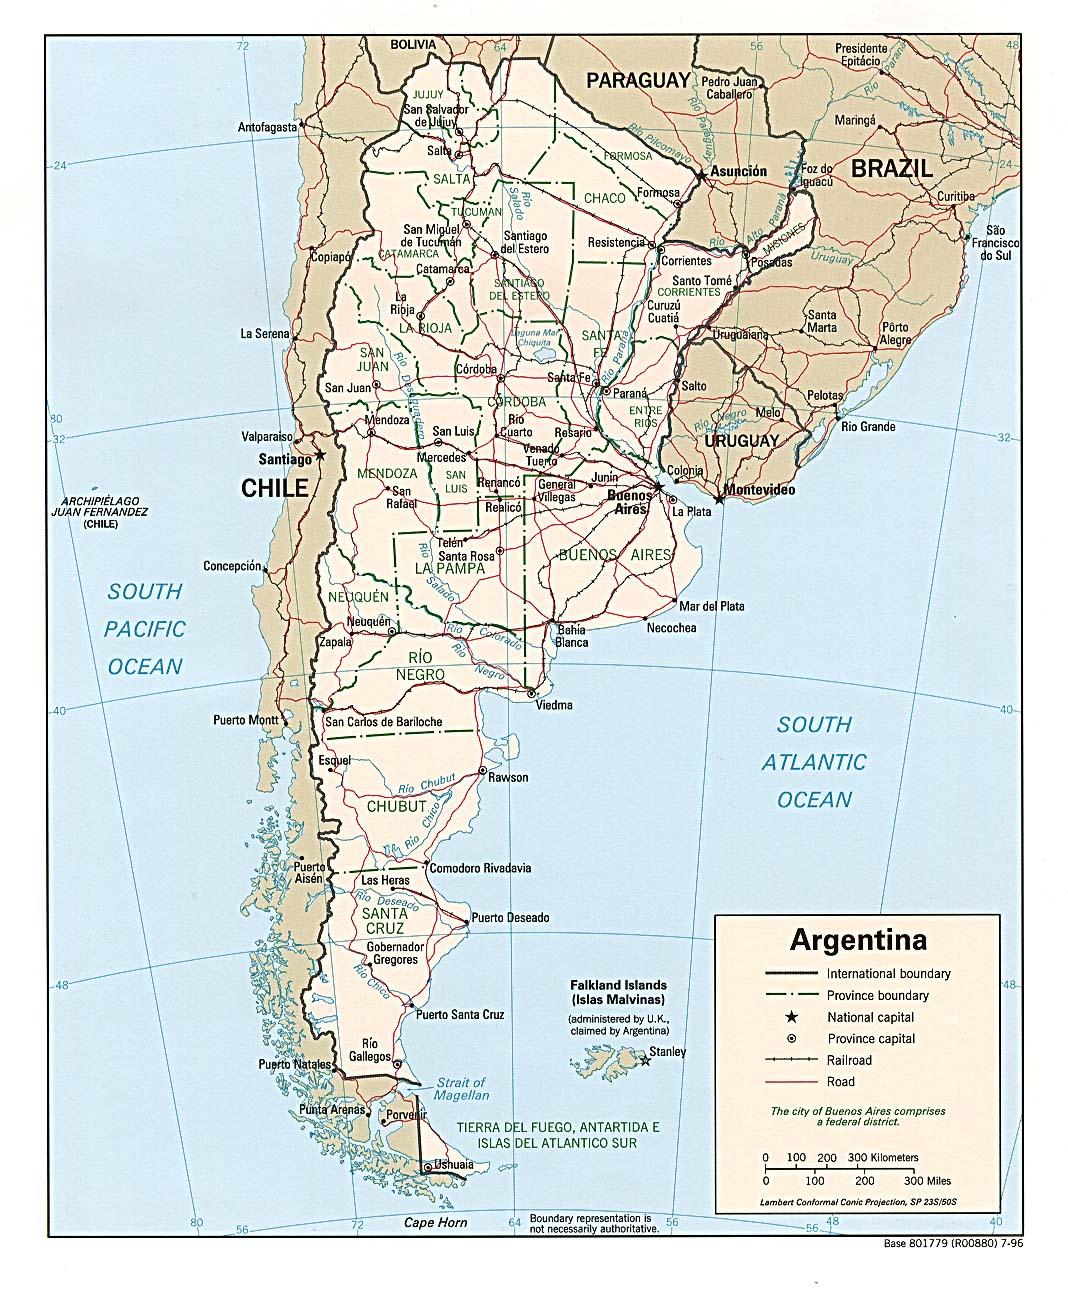 Mapa Politico Argentina 1996